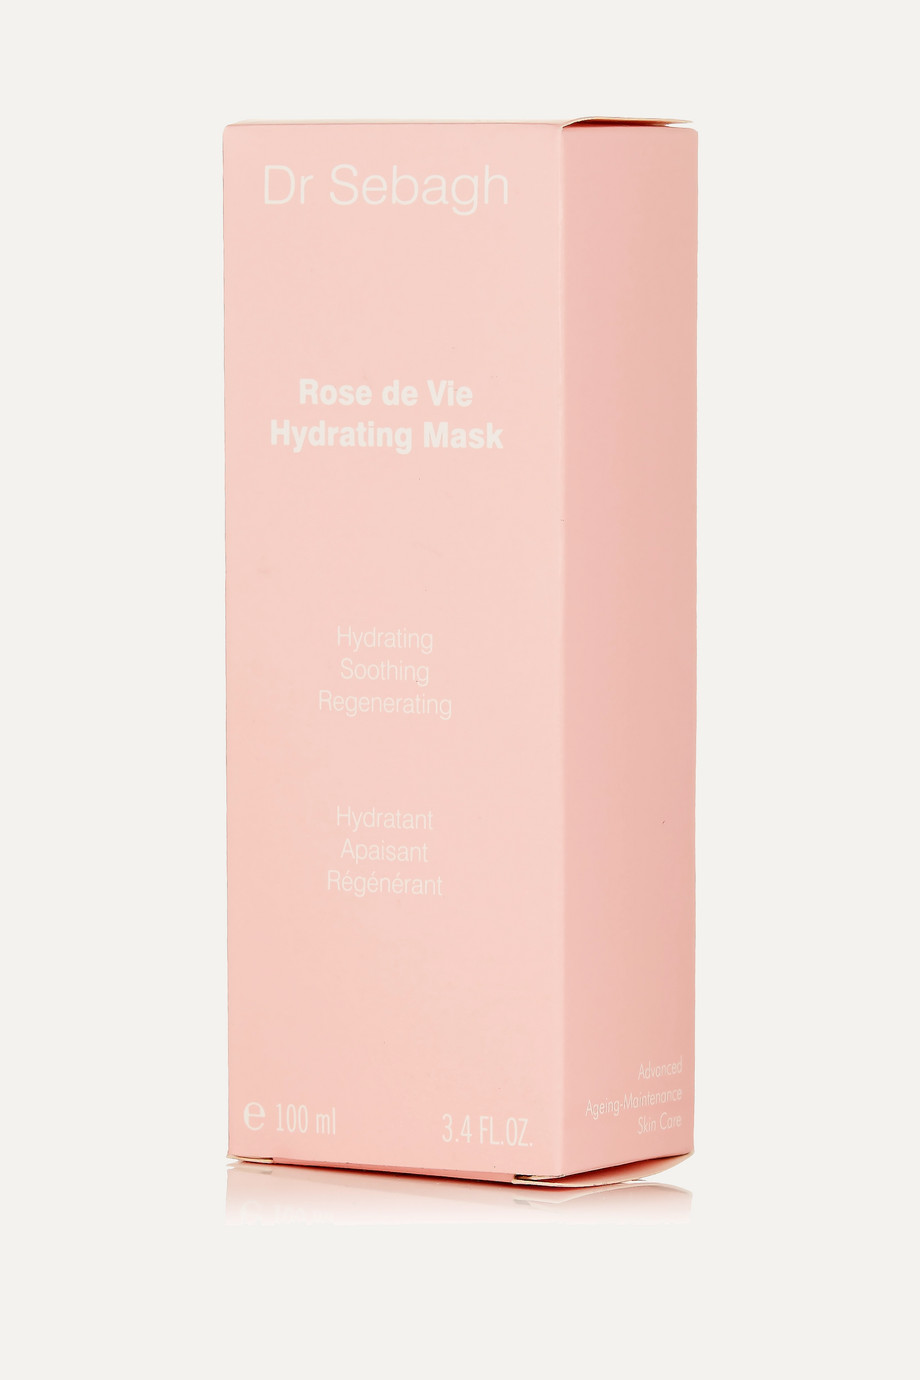 Dr Sebagh Masque hydratant Rose de Vie, 100 ml